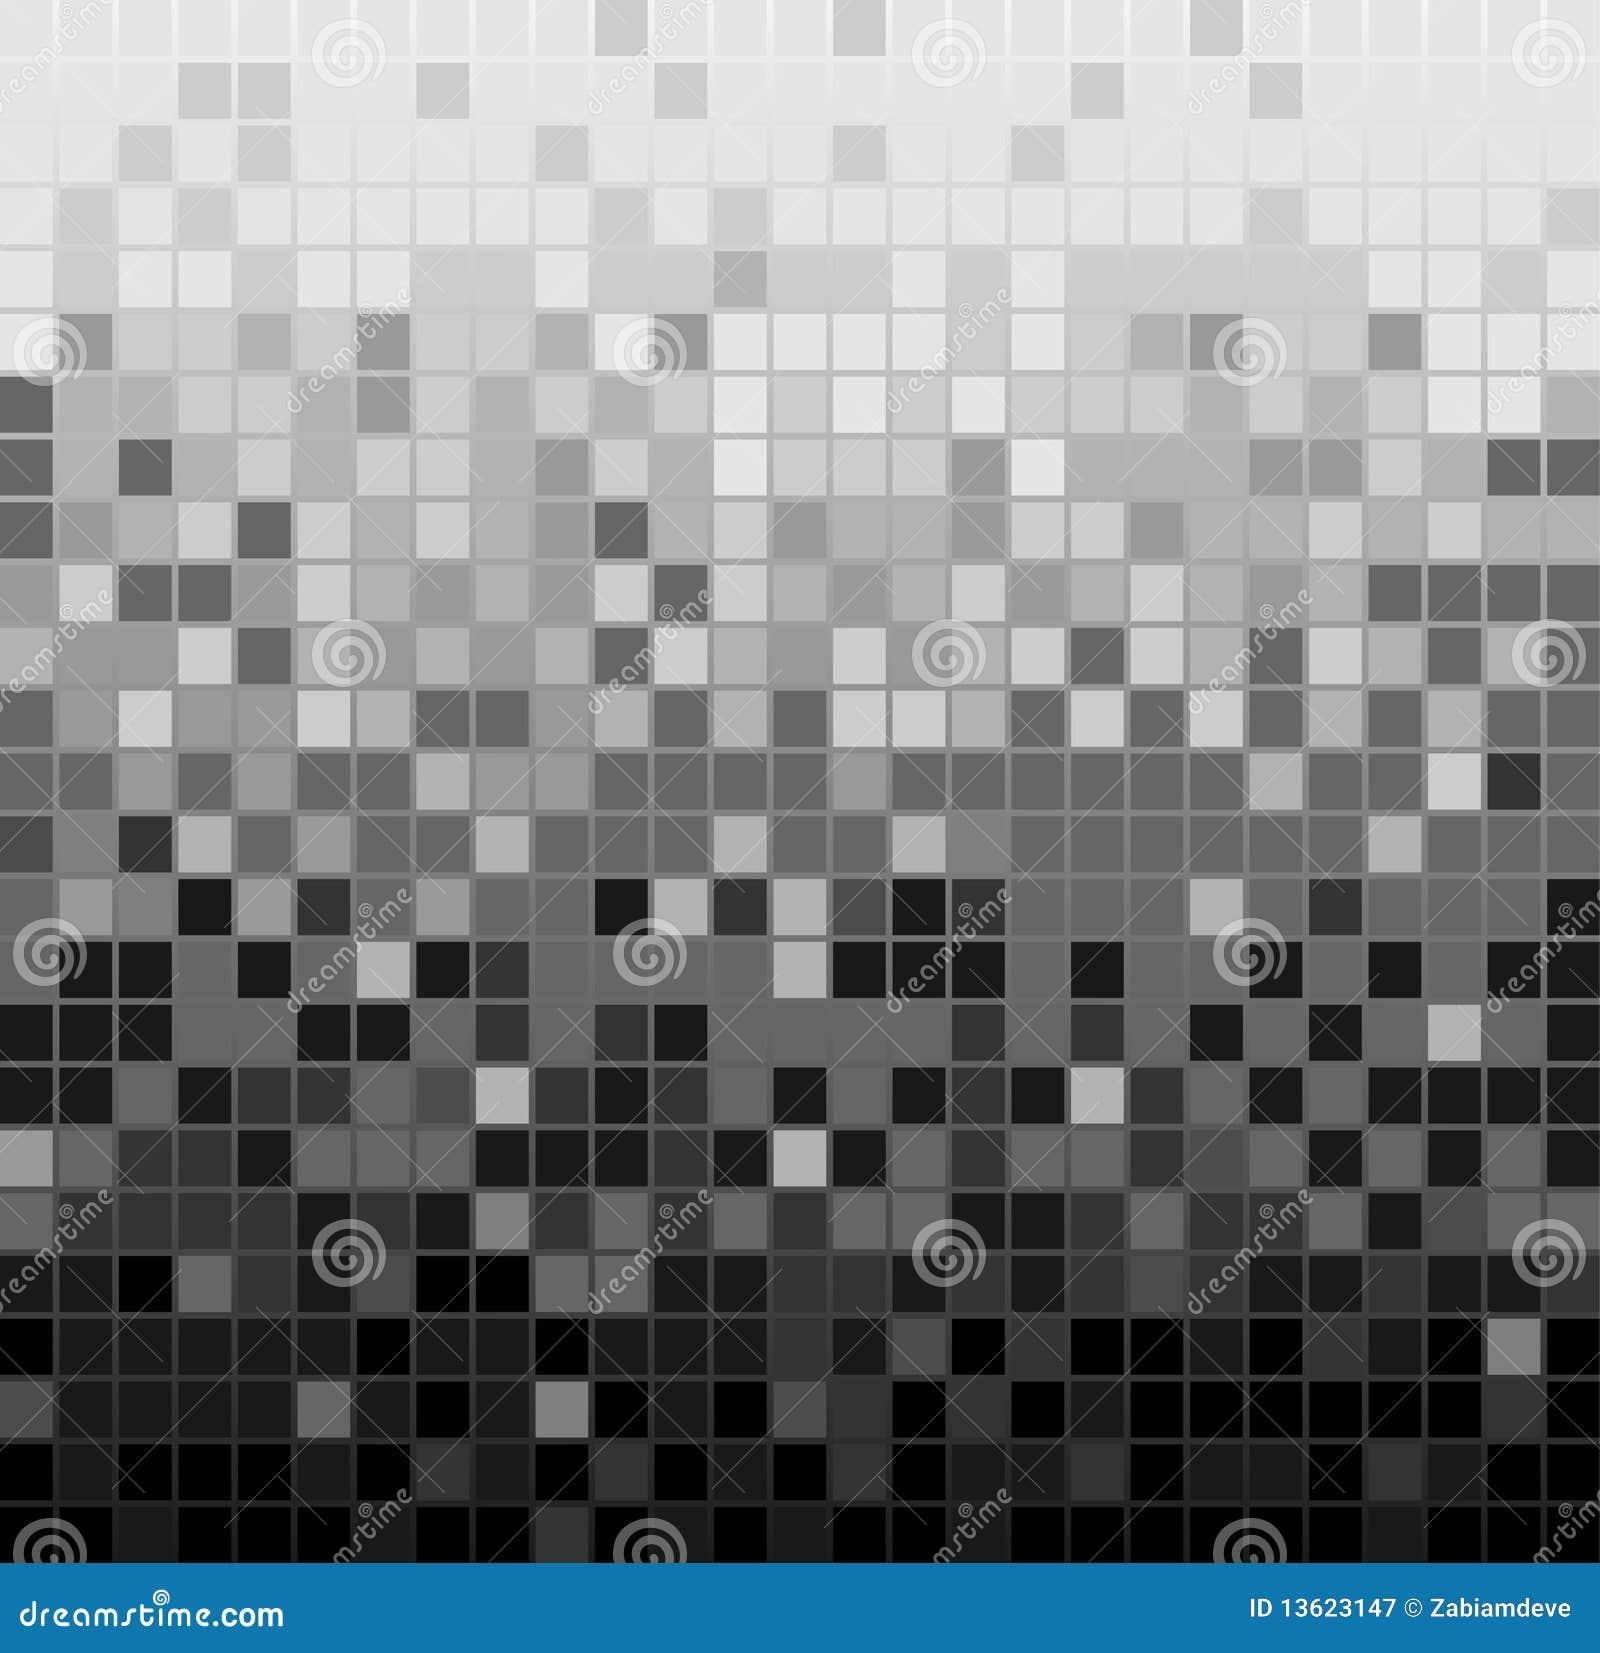 Abstrakt fyrkantig PIXELmosaikbakgrund